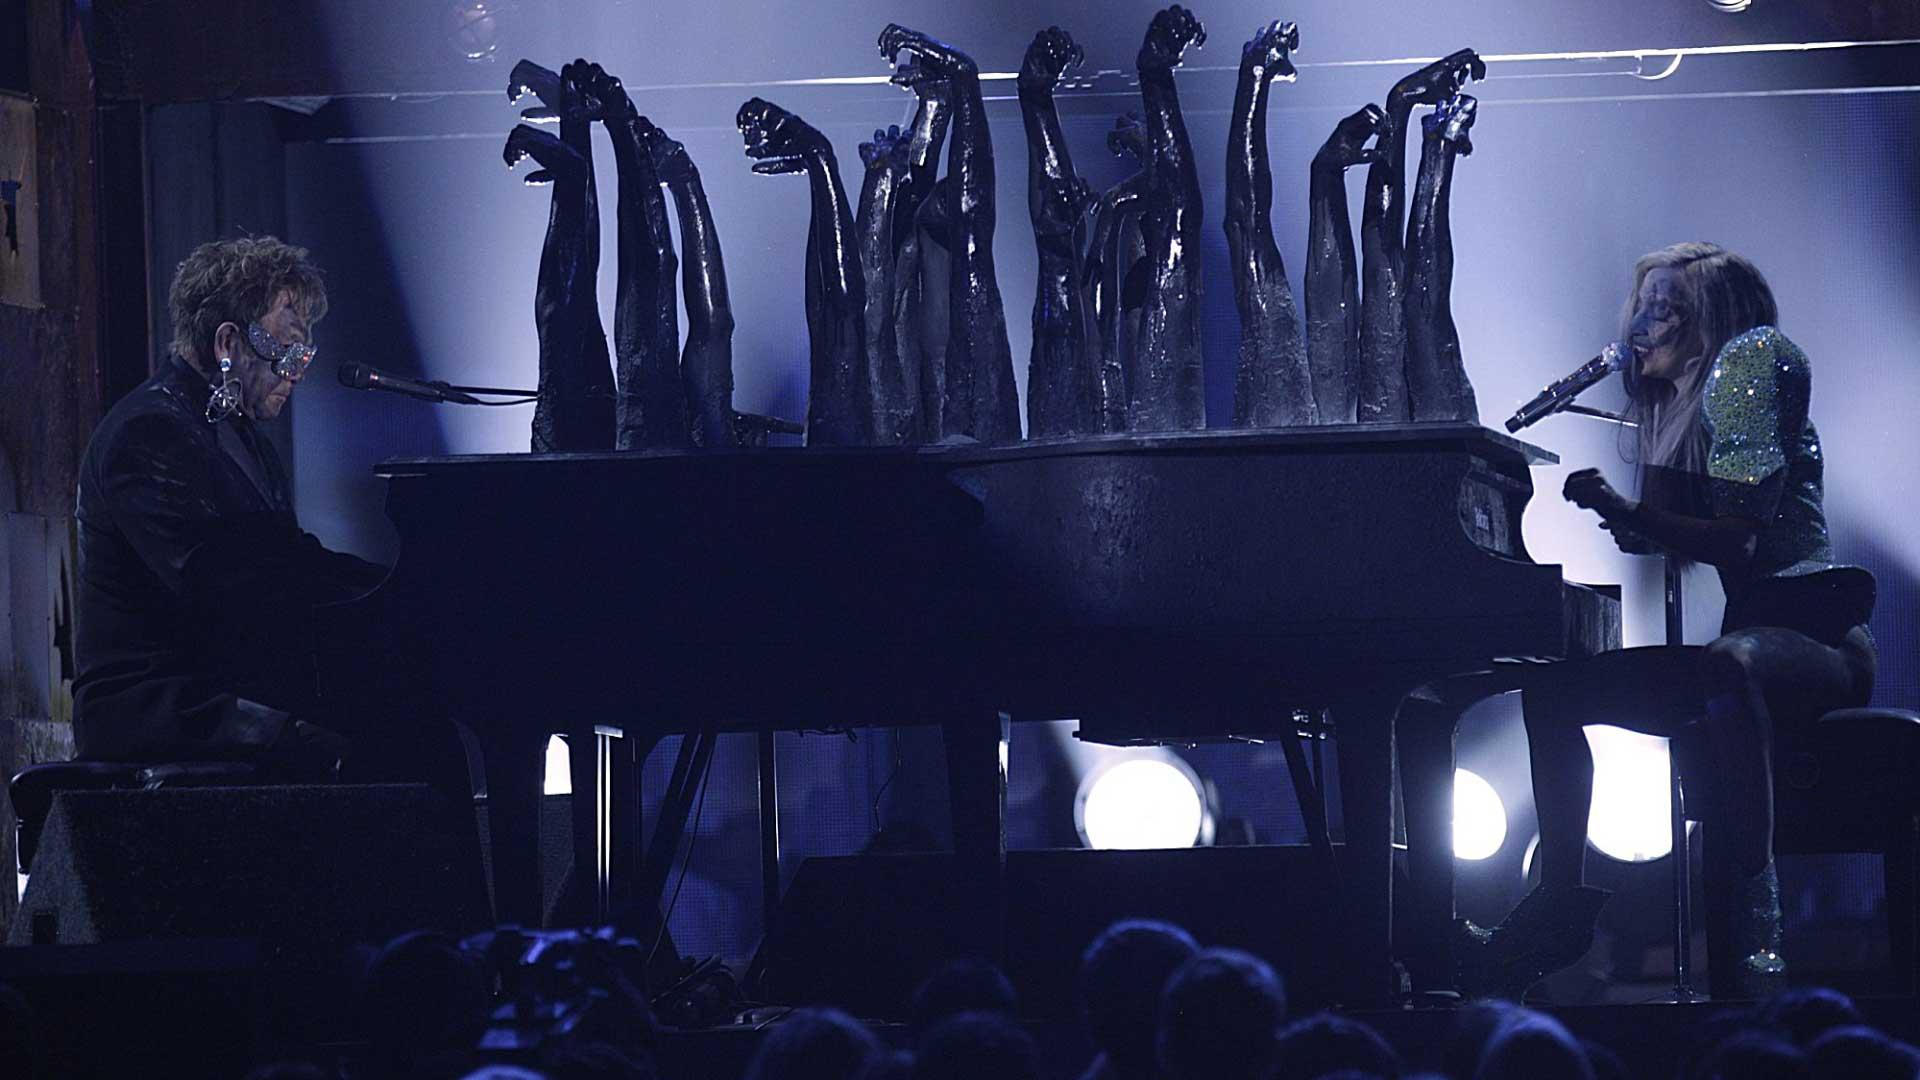 Elton John and Lady Gaga perform